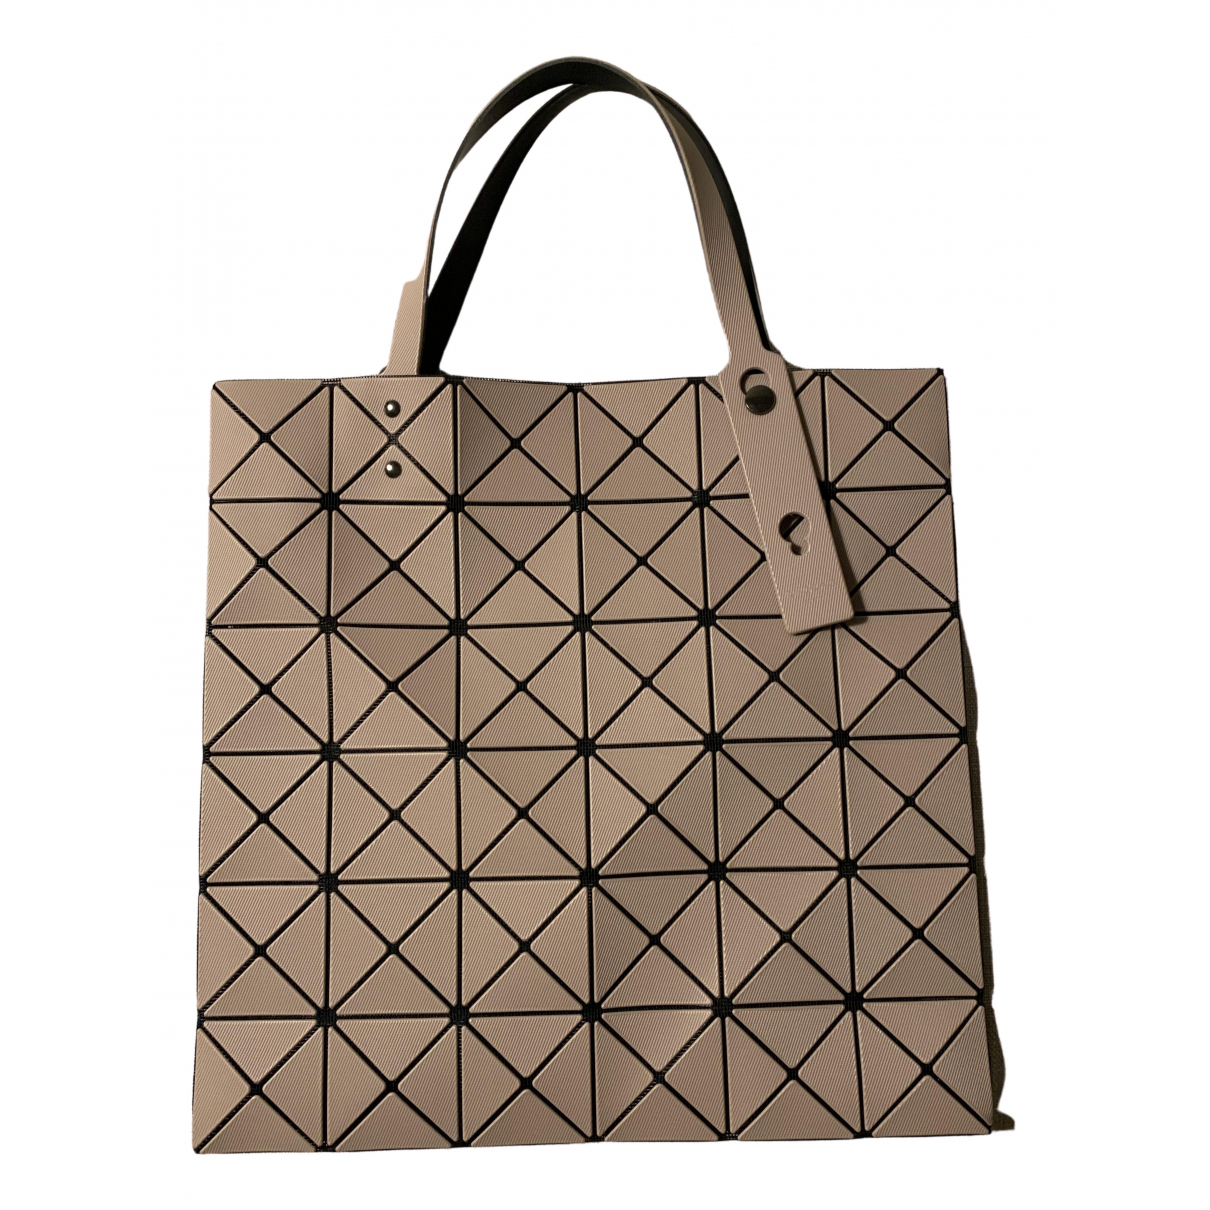 Issey Miyake \N Handtasche in  Beige Kunststoff